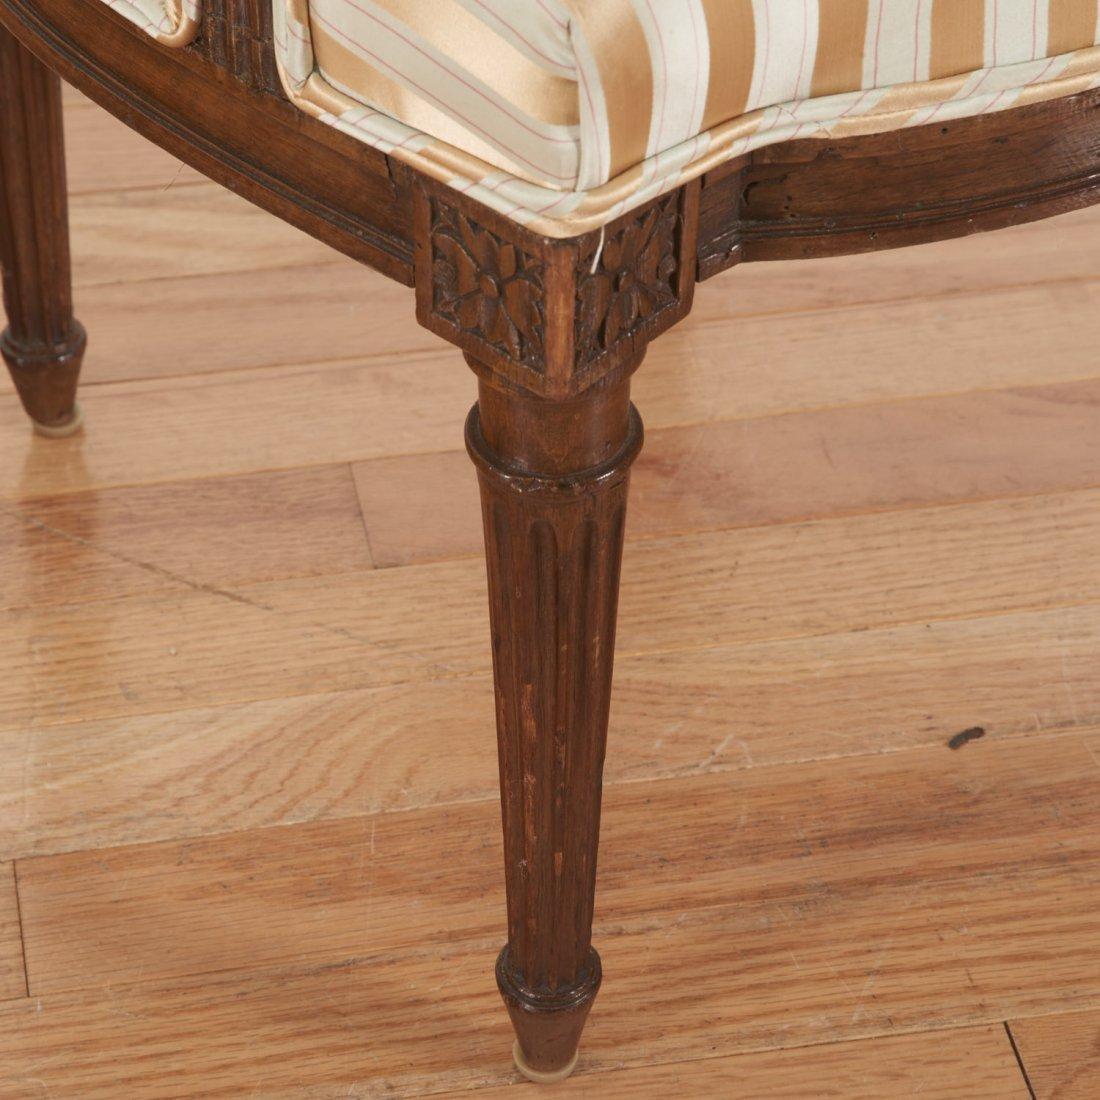 Pr Directoire silk upholstered mahogany fauteuils - 6